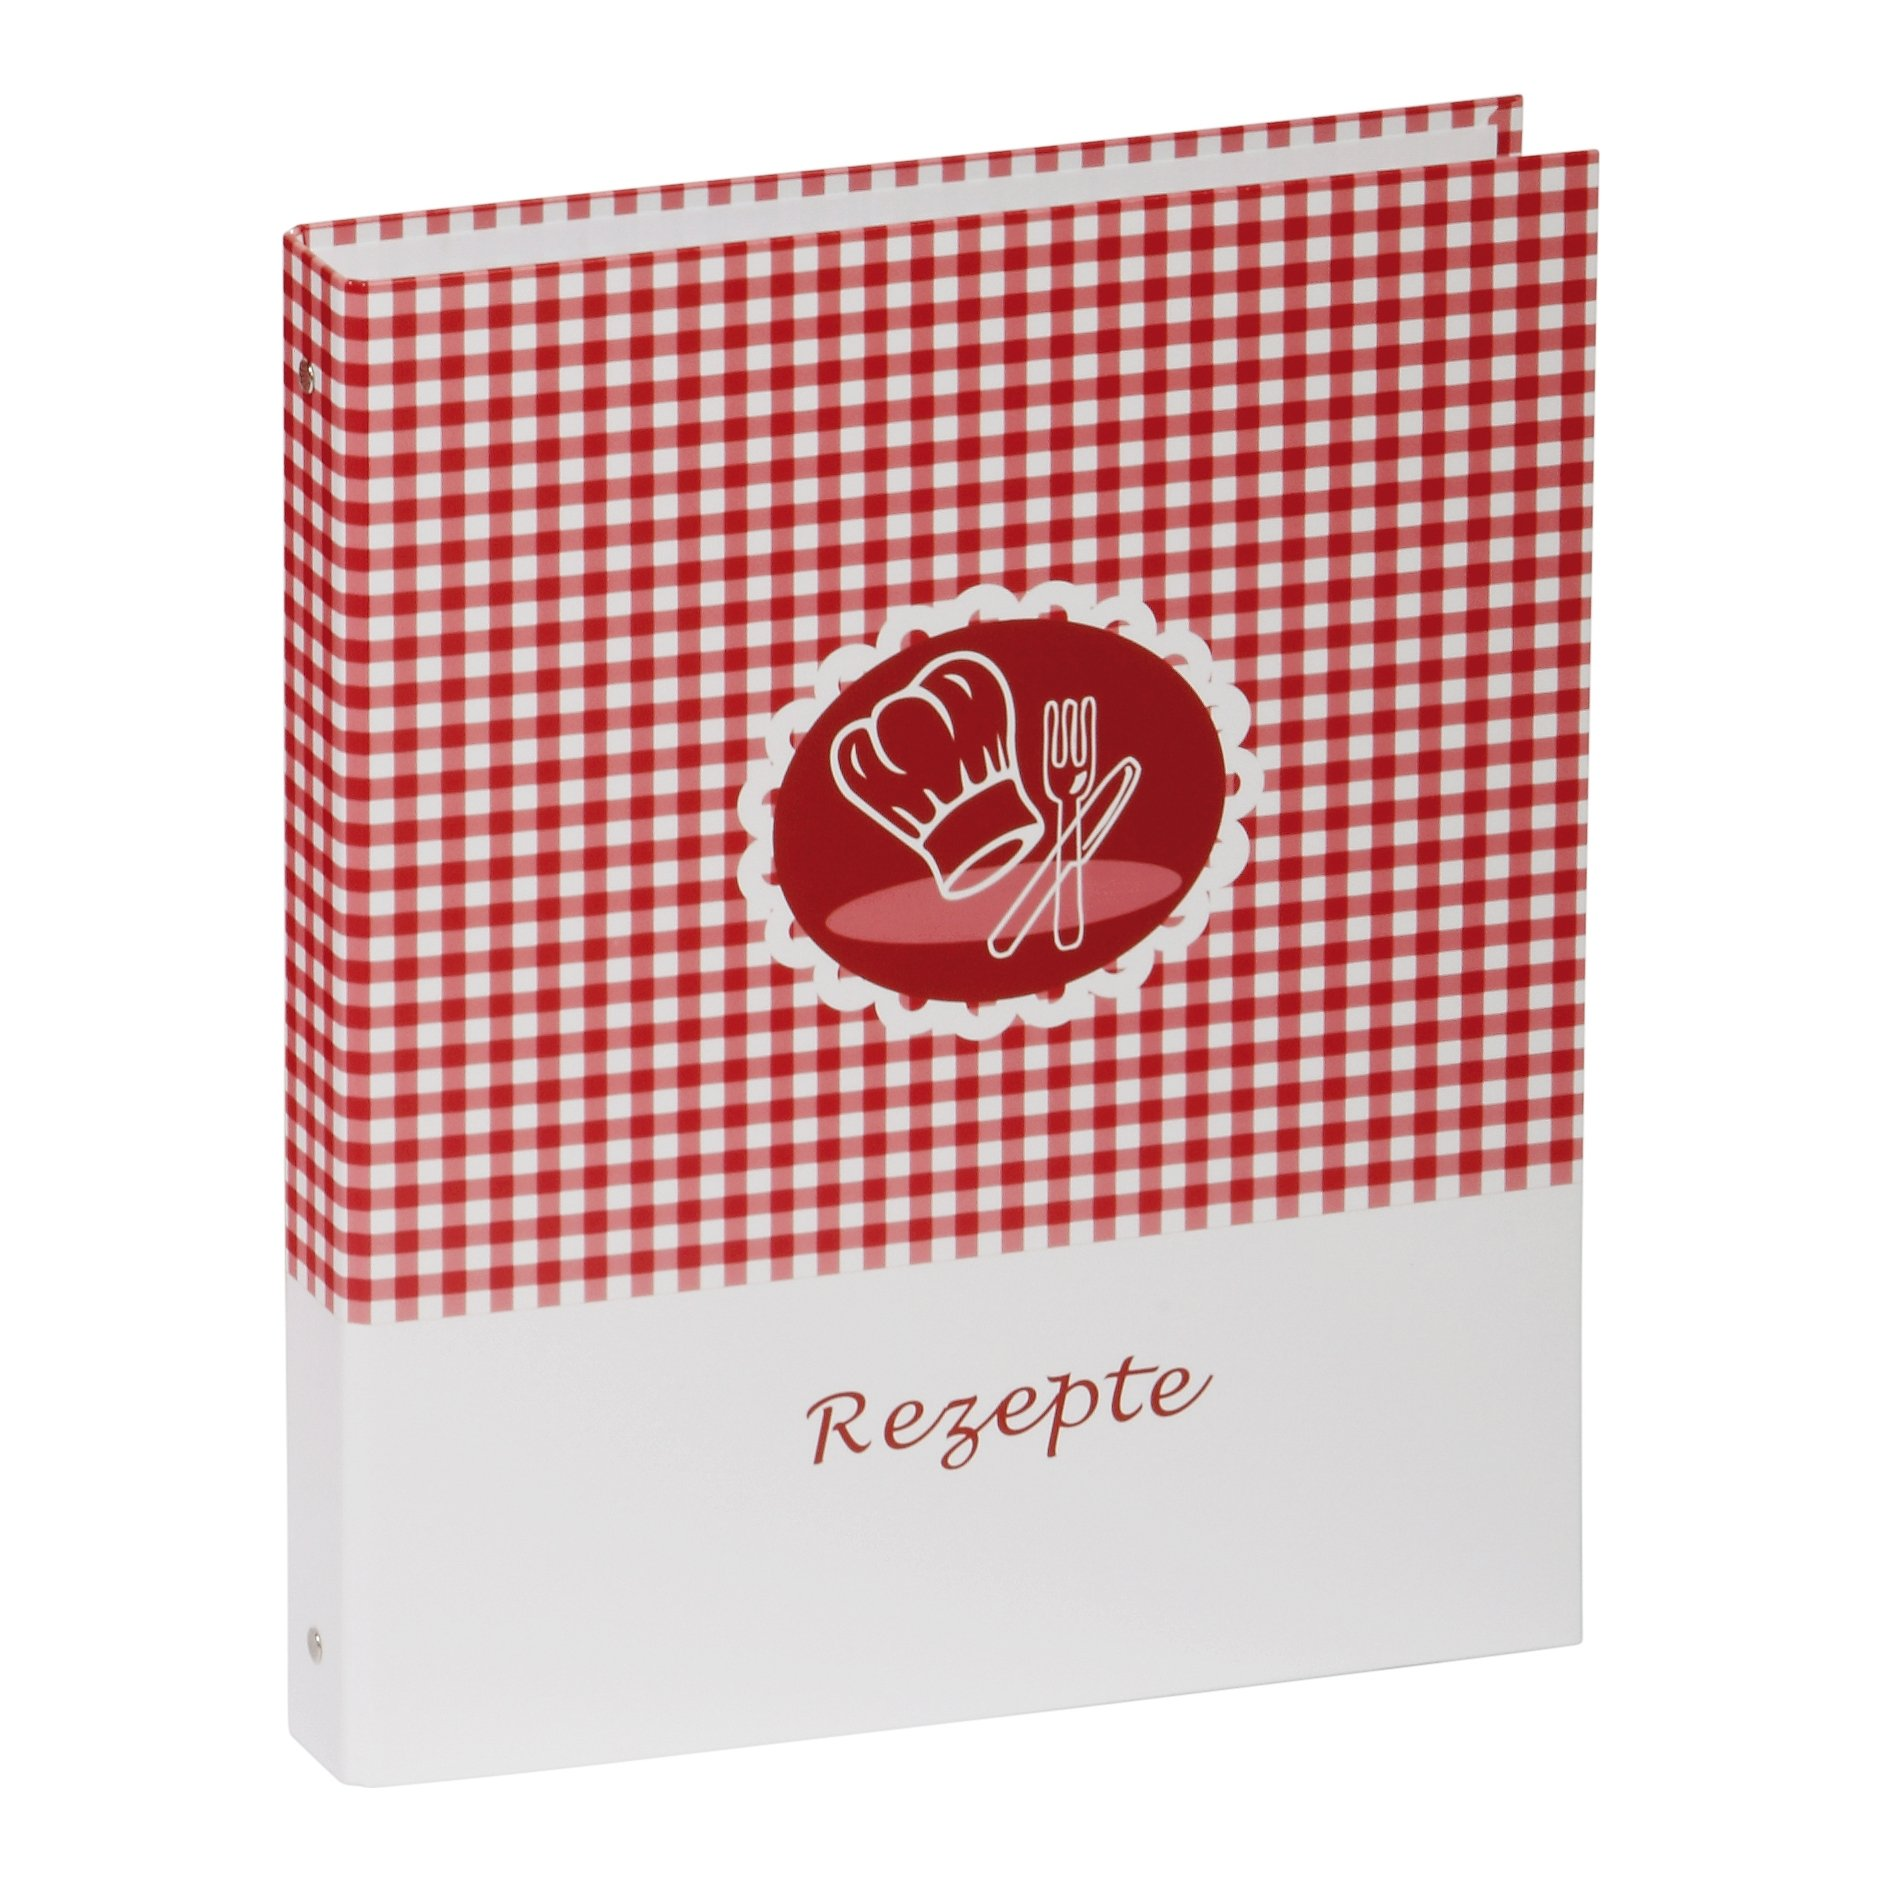 Beanbone Pagna 31317-15 Recipe Ring Binder A4 / Laminated